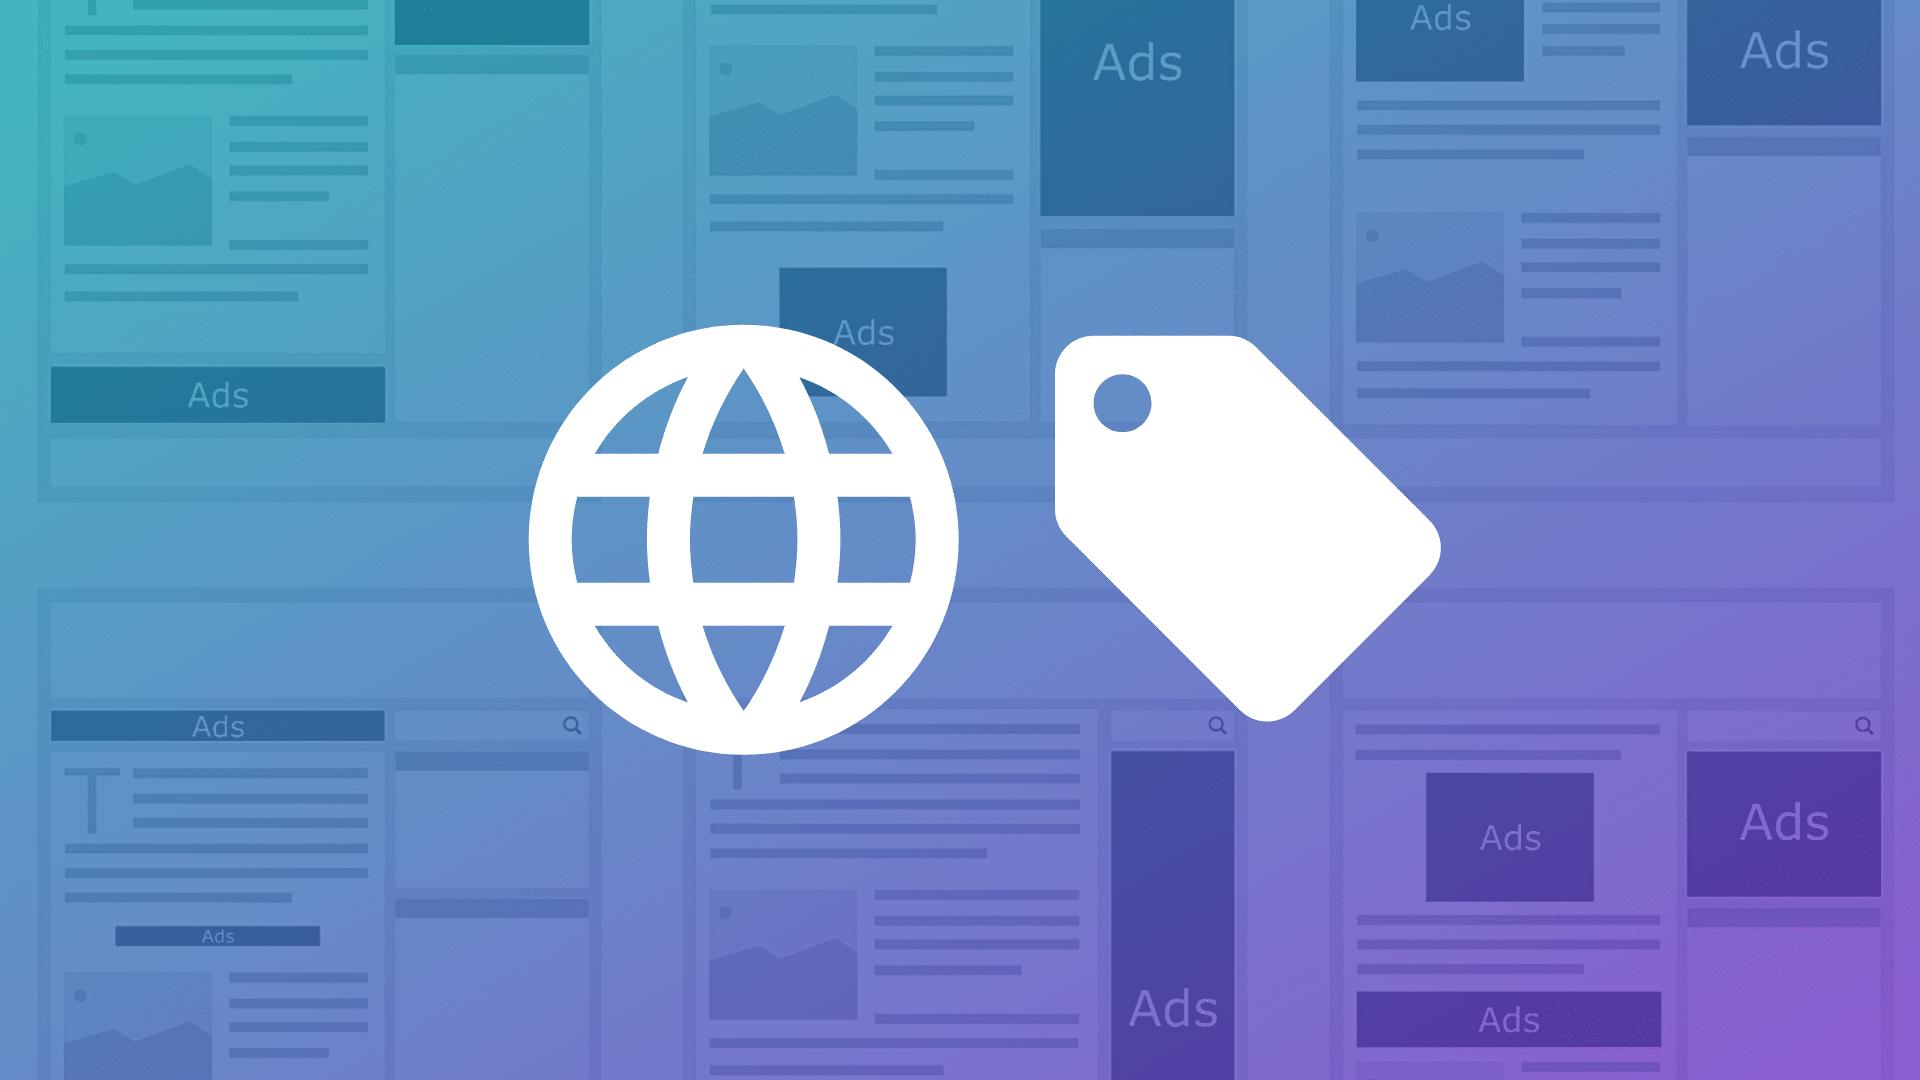 global-ads-background